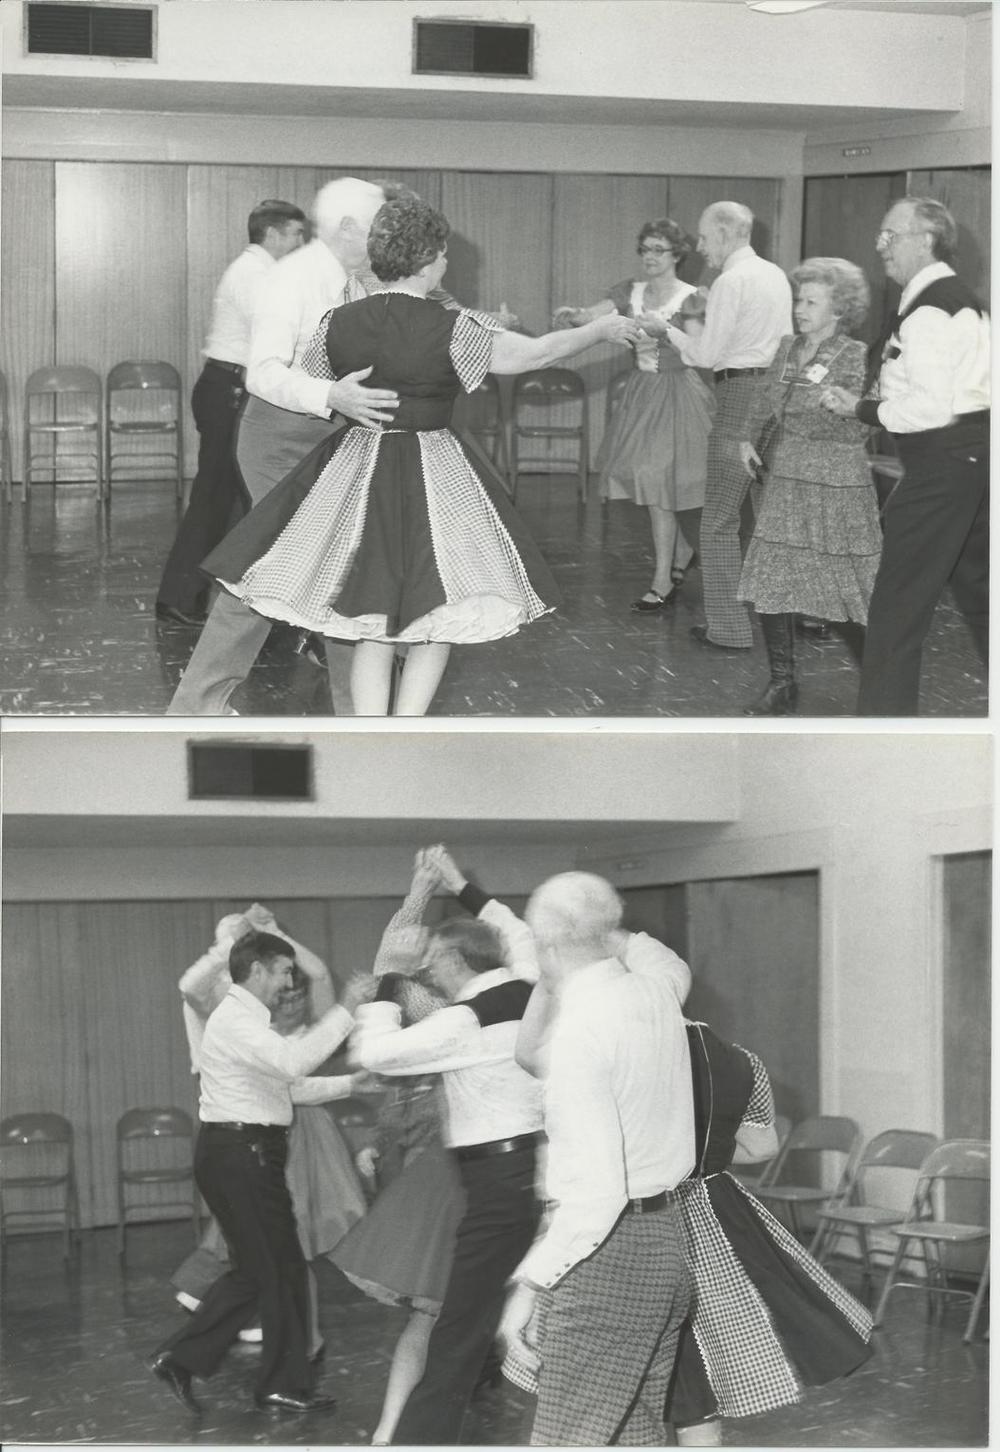 PMBC+Square+Dancing+Wilson,+Wood,++Fletcher,+Faile,+Russom+c.+1970.jpg